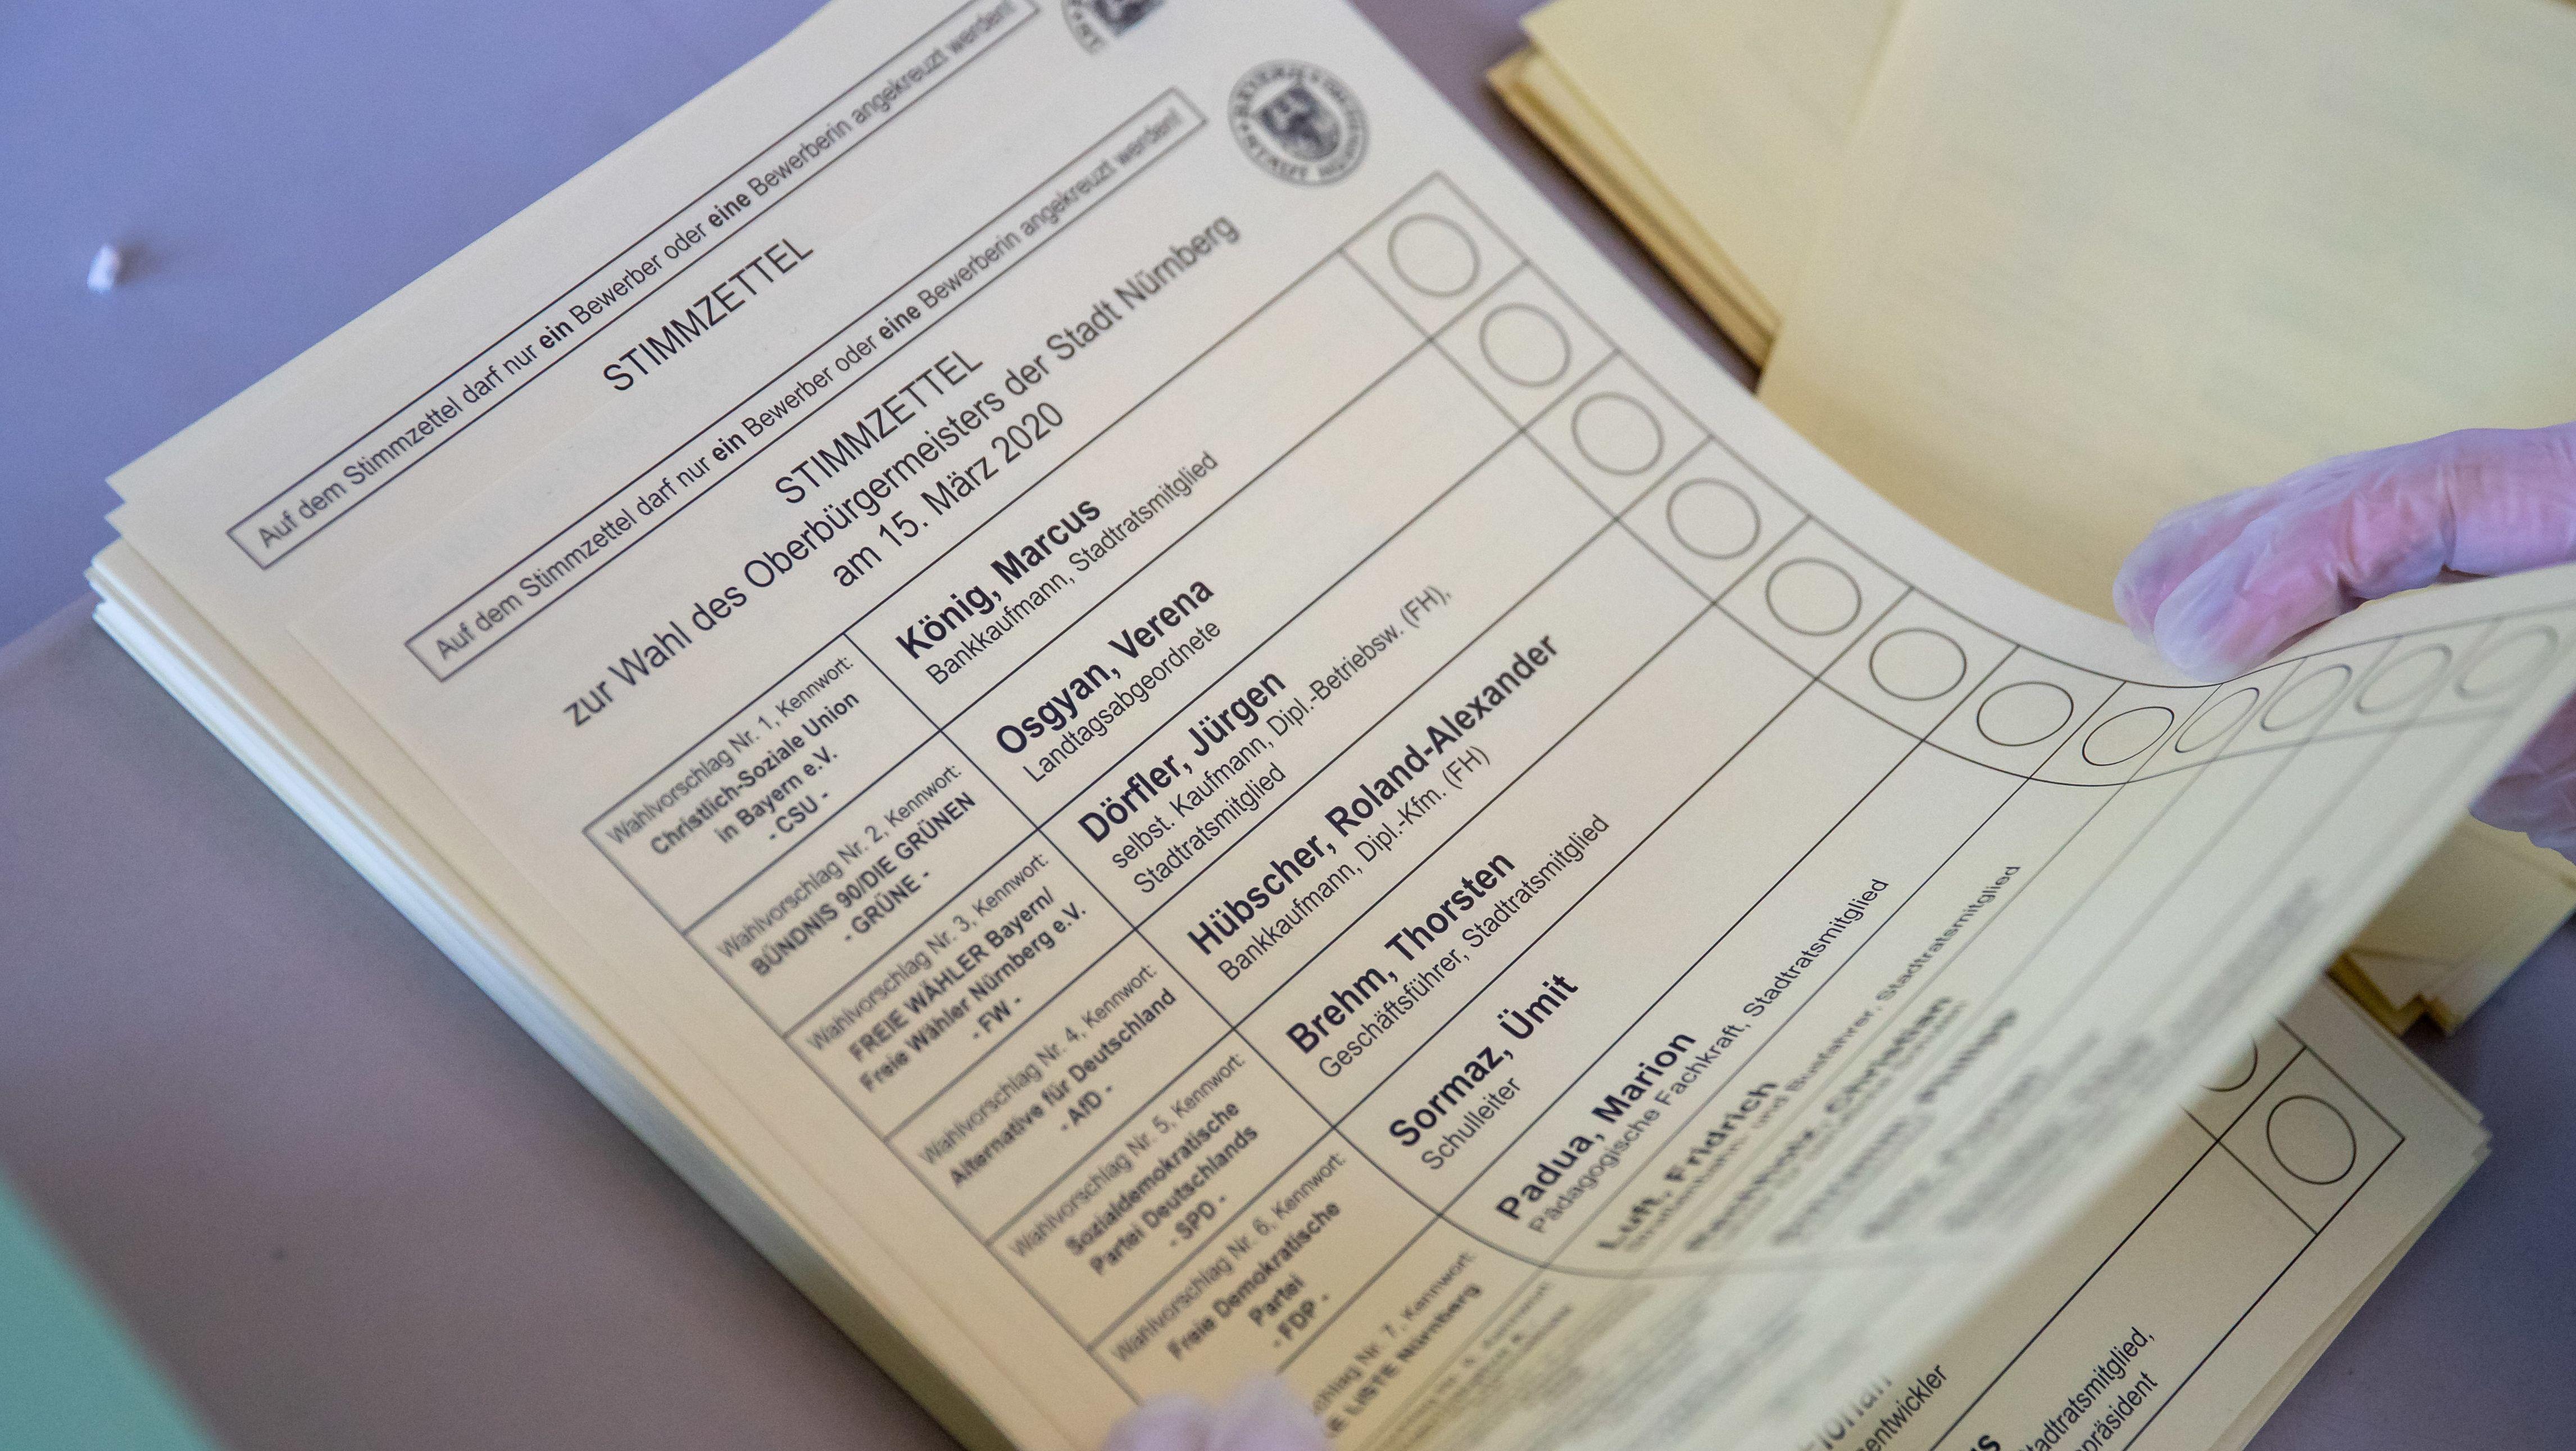 Wahlzettel für die Kommunalwahl in Nürnberg